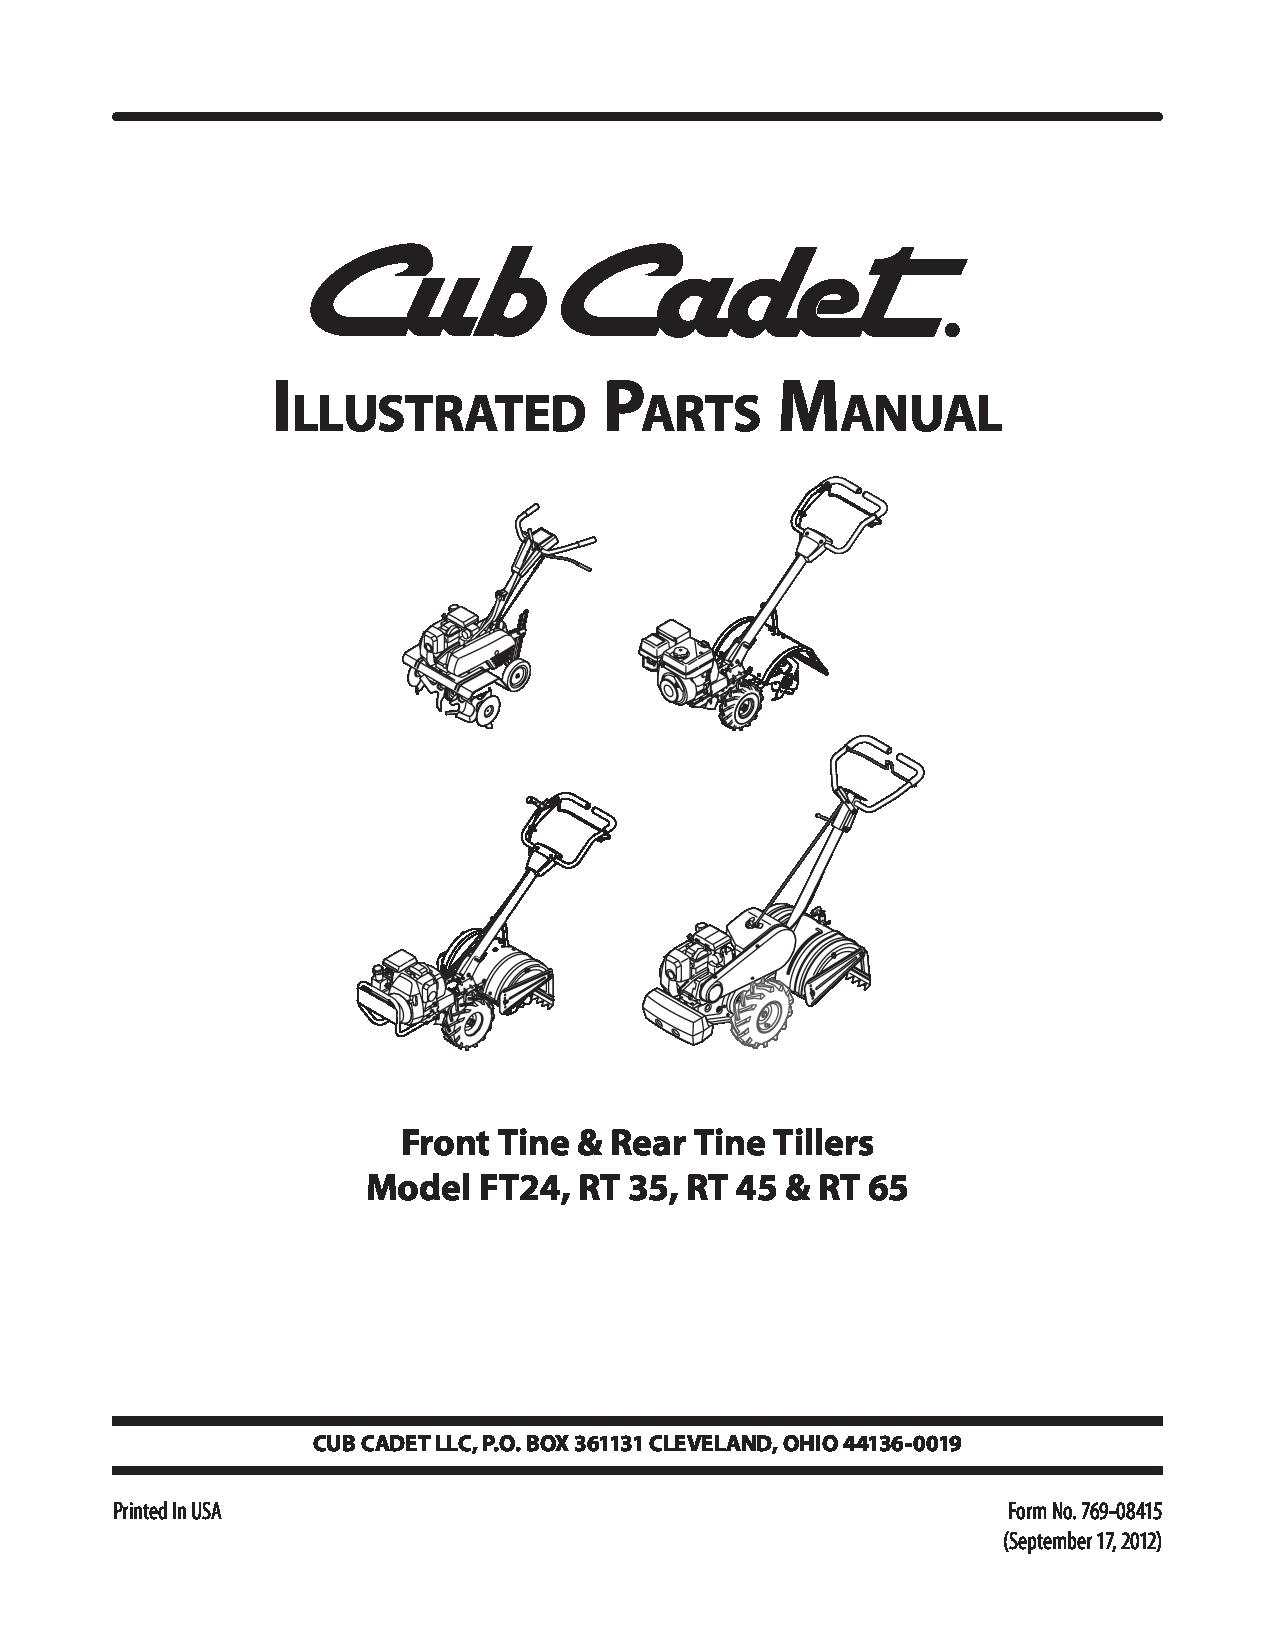 Wiring Database 2020  25 Cub Cadet Tiller Parts Diagram